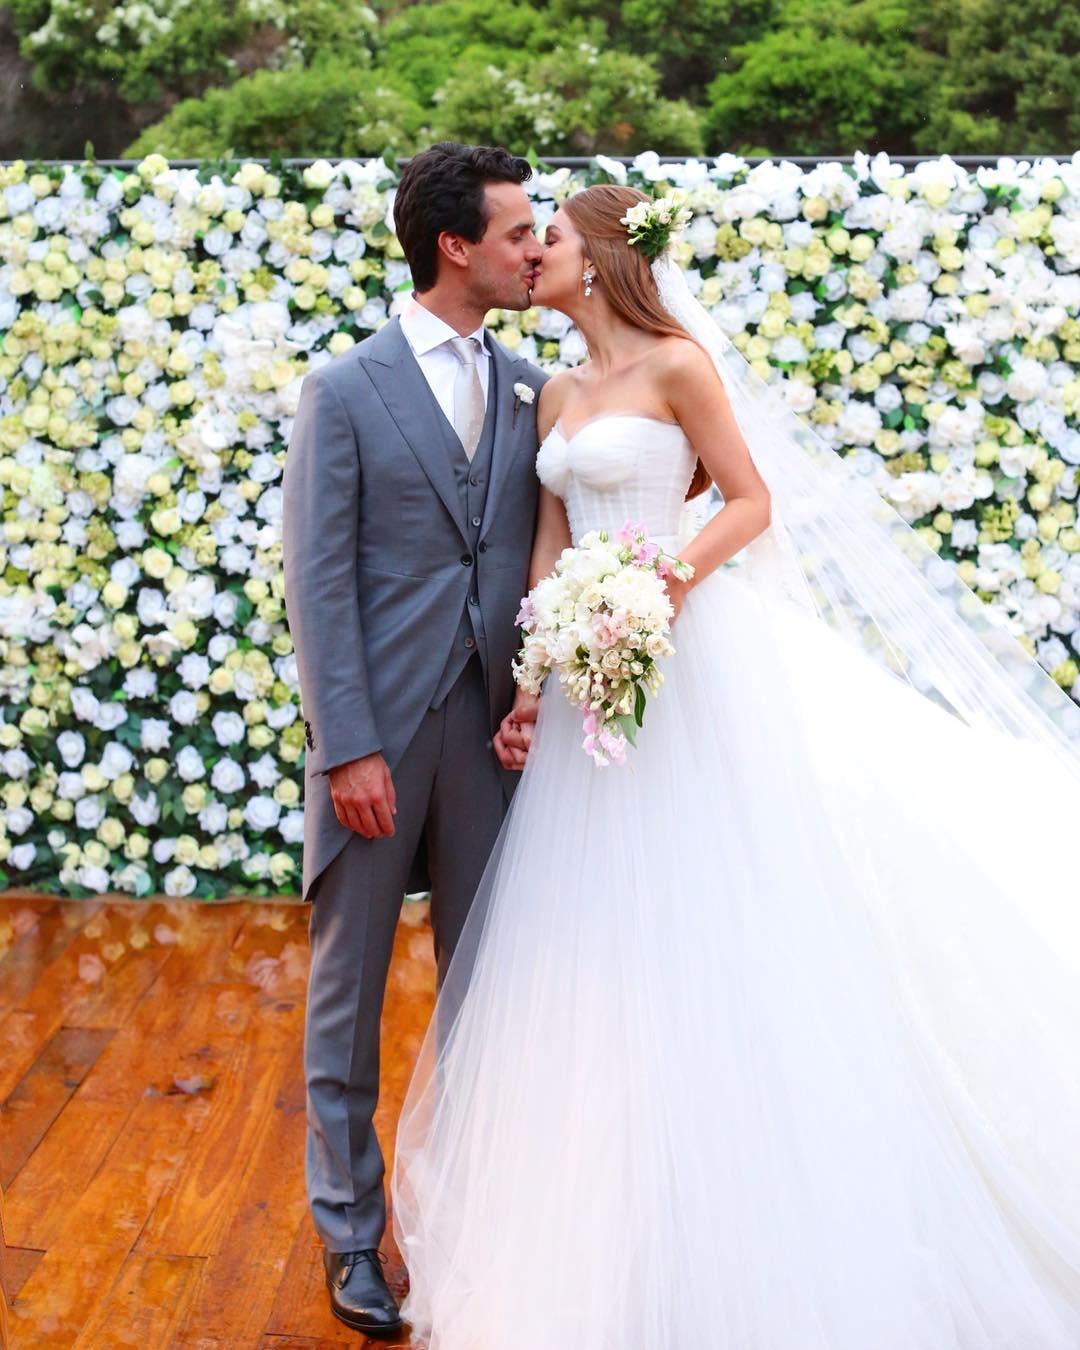 f60ba785a57ba Veja fotos do casamento da atriz Marina Ruy Barbosa - Famosos ...